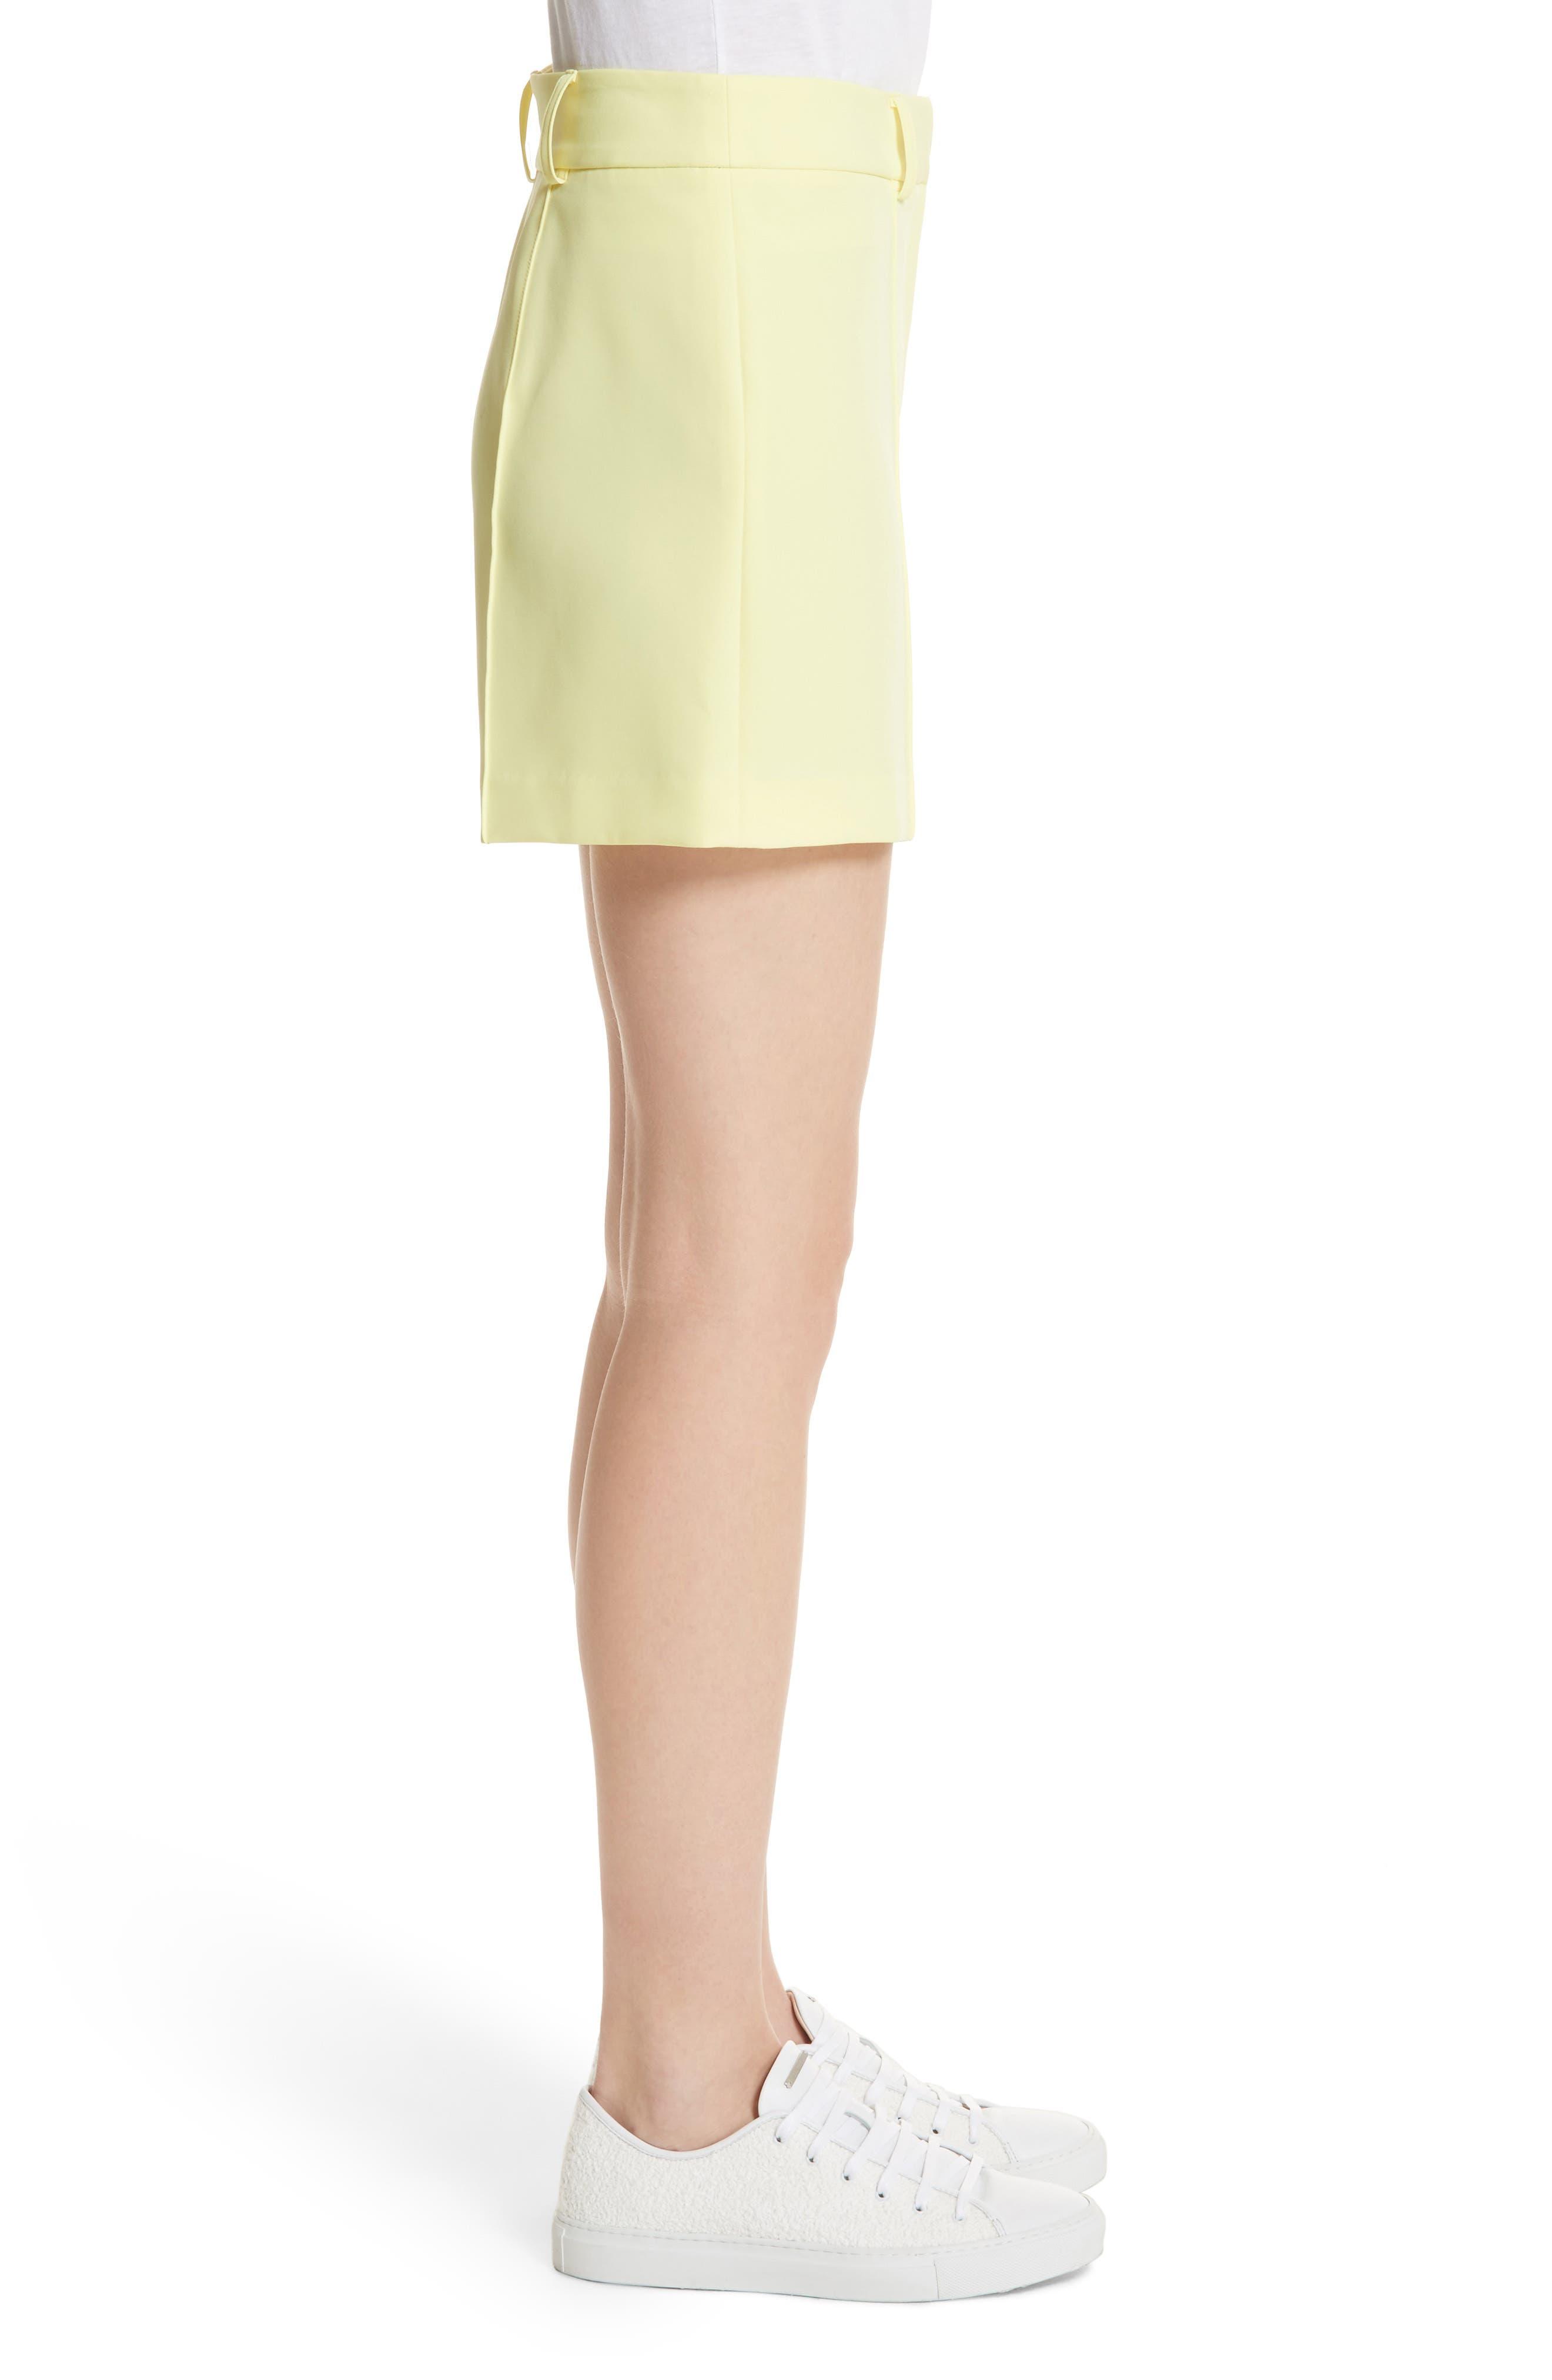 Hayden Trouser Shorts,                             Alternate thumbnail 3, color,                             Lemon Yellow